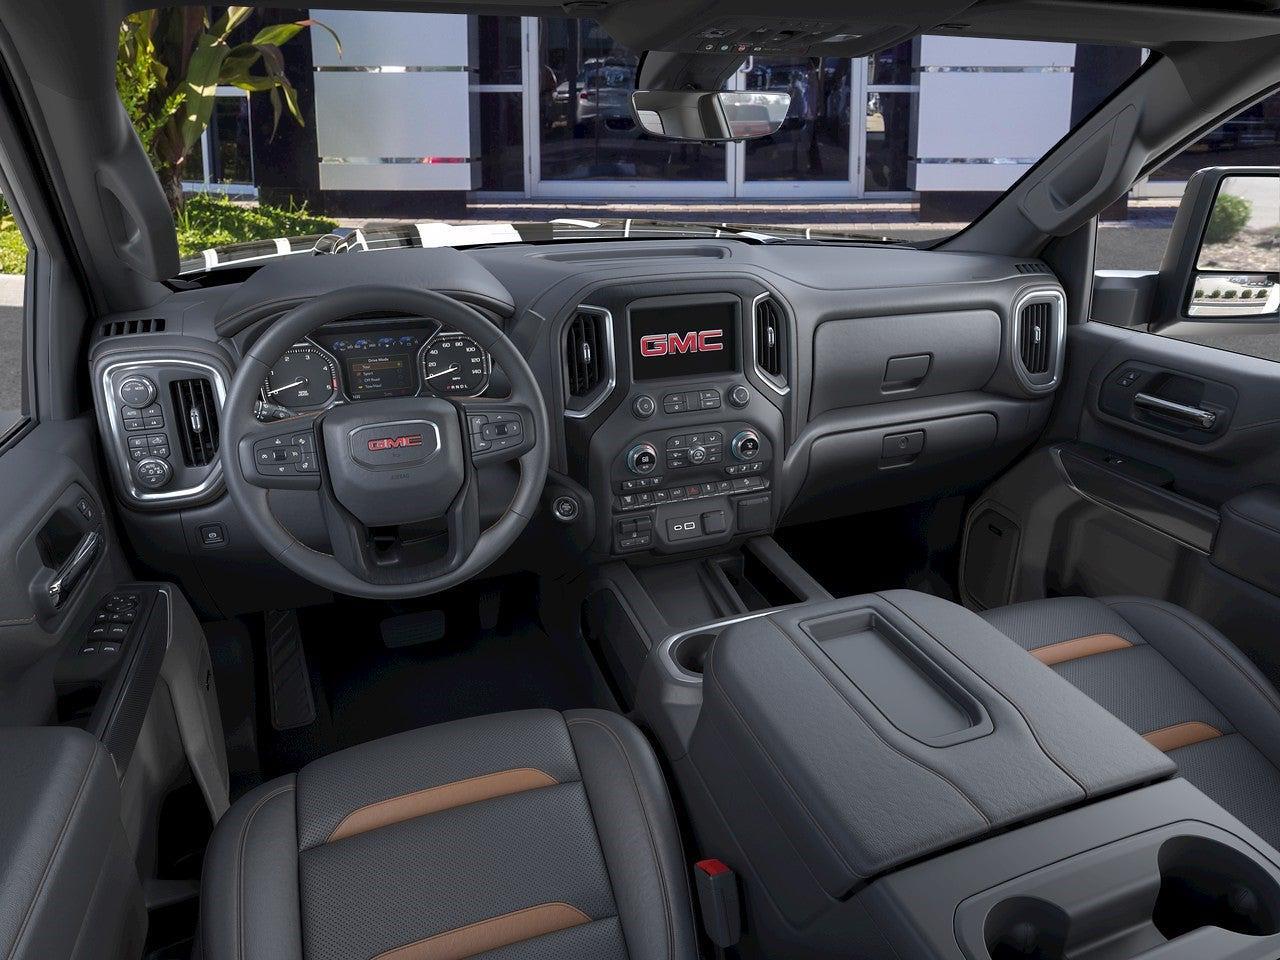 2021 GMC Sierra 2500 Crew Cab 4x4, Pickup #T21304 - photo 32